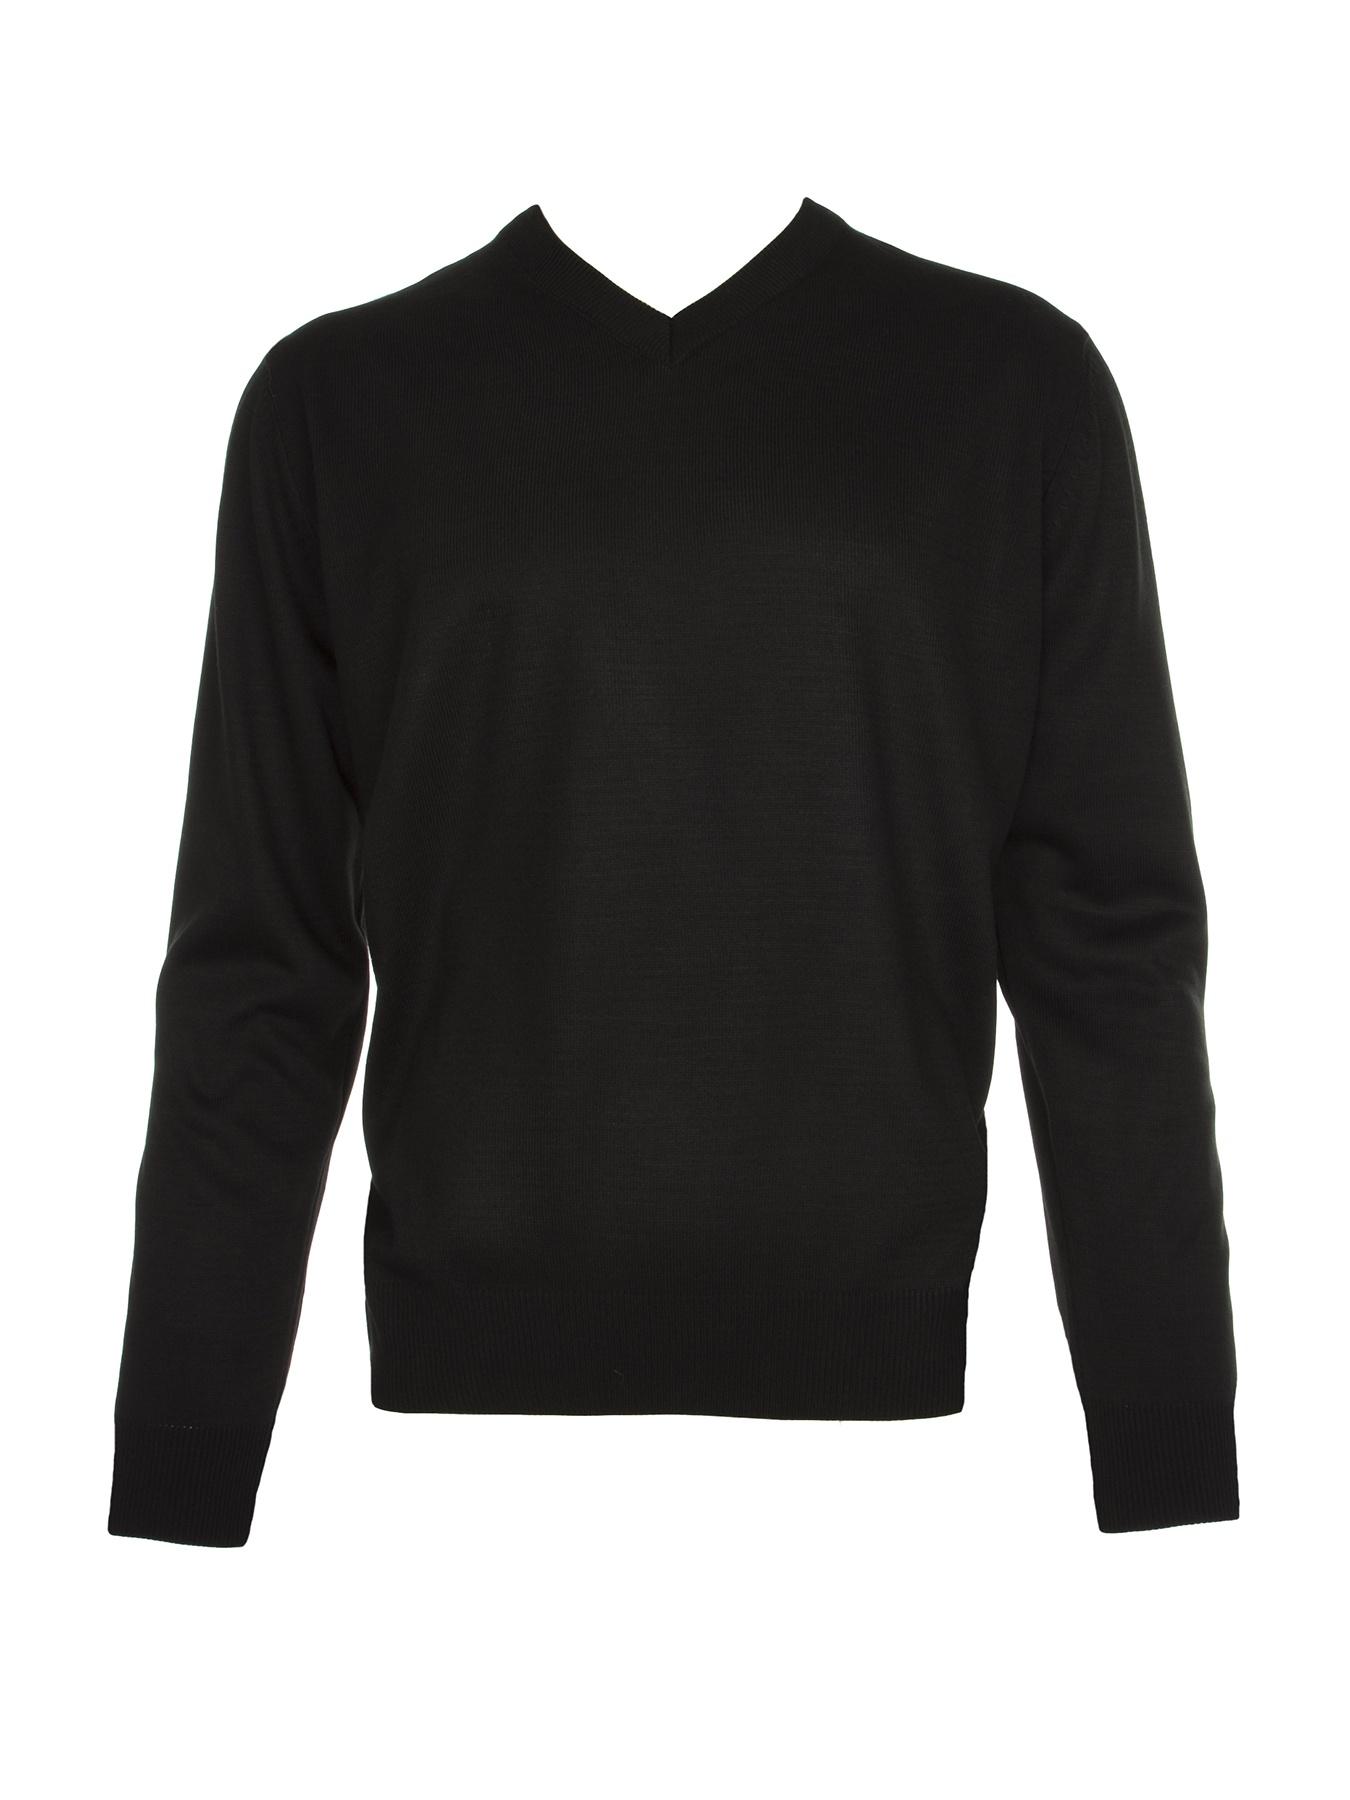 Пуловер Rabsido пуловер стандартного покроя